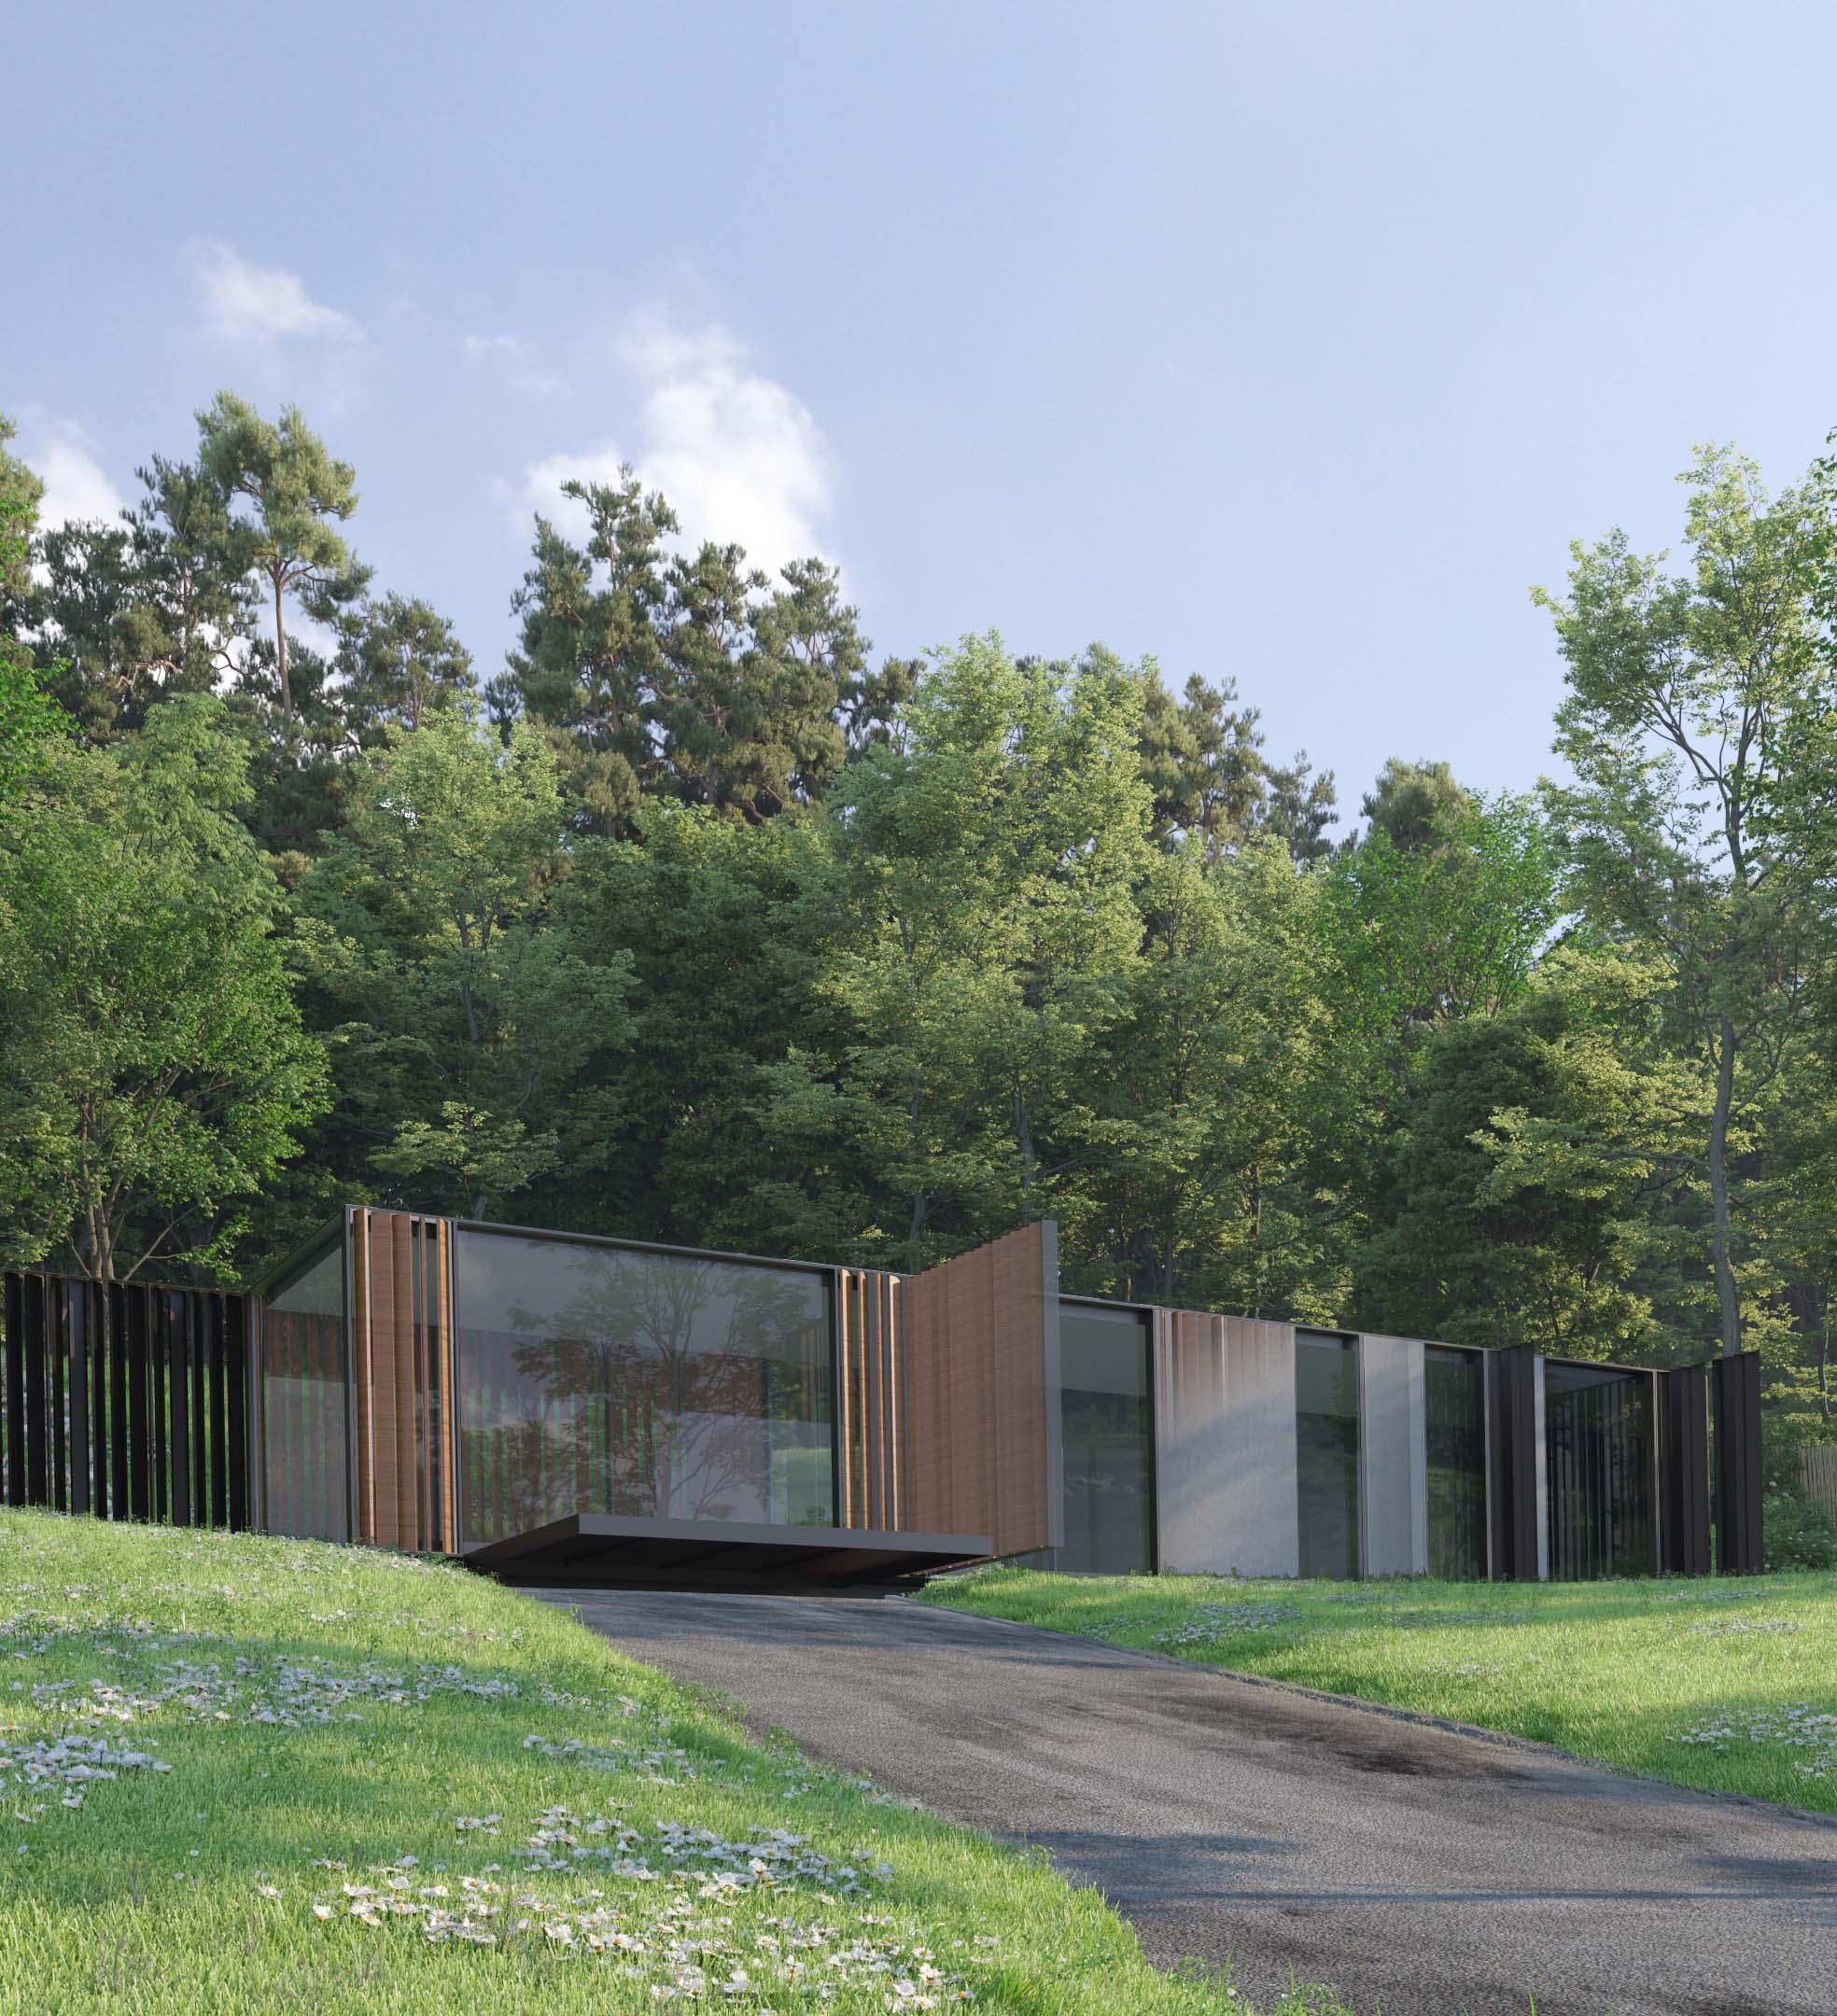 Modela tu edificio de arquitectura modular inteligente.